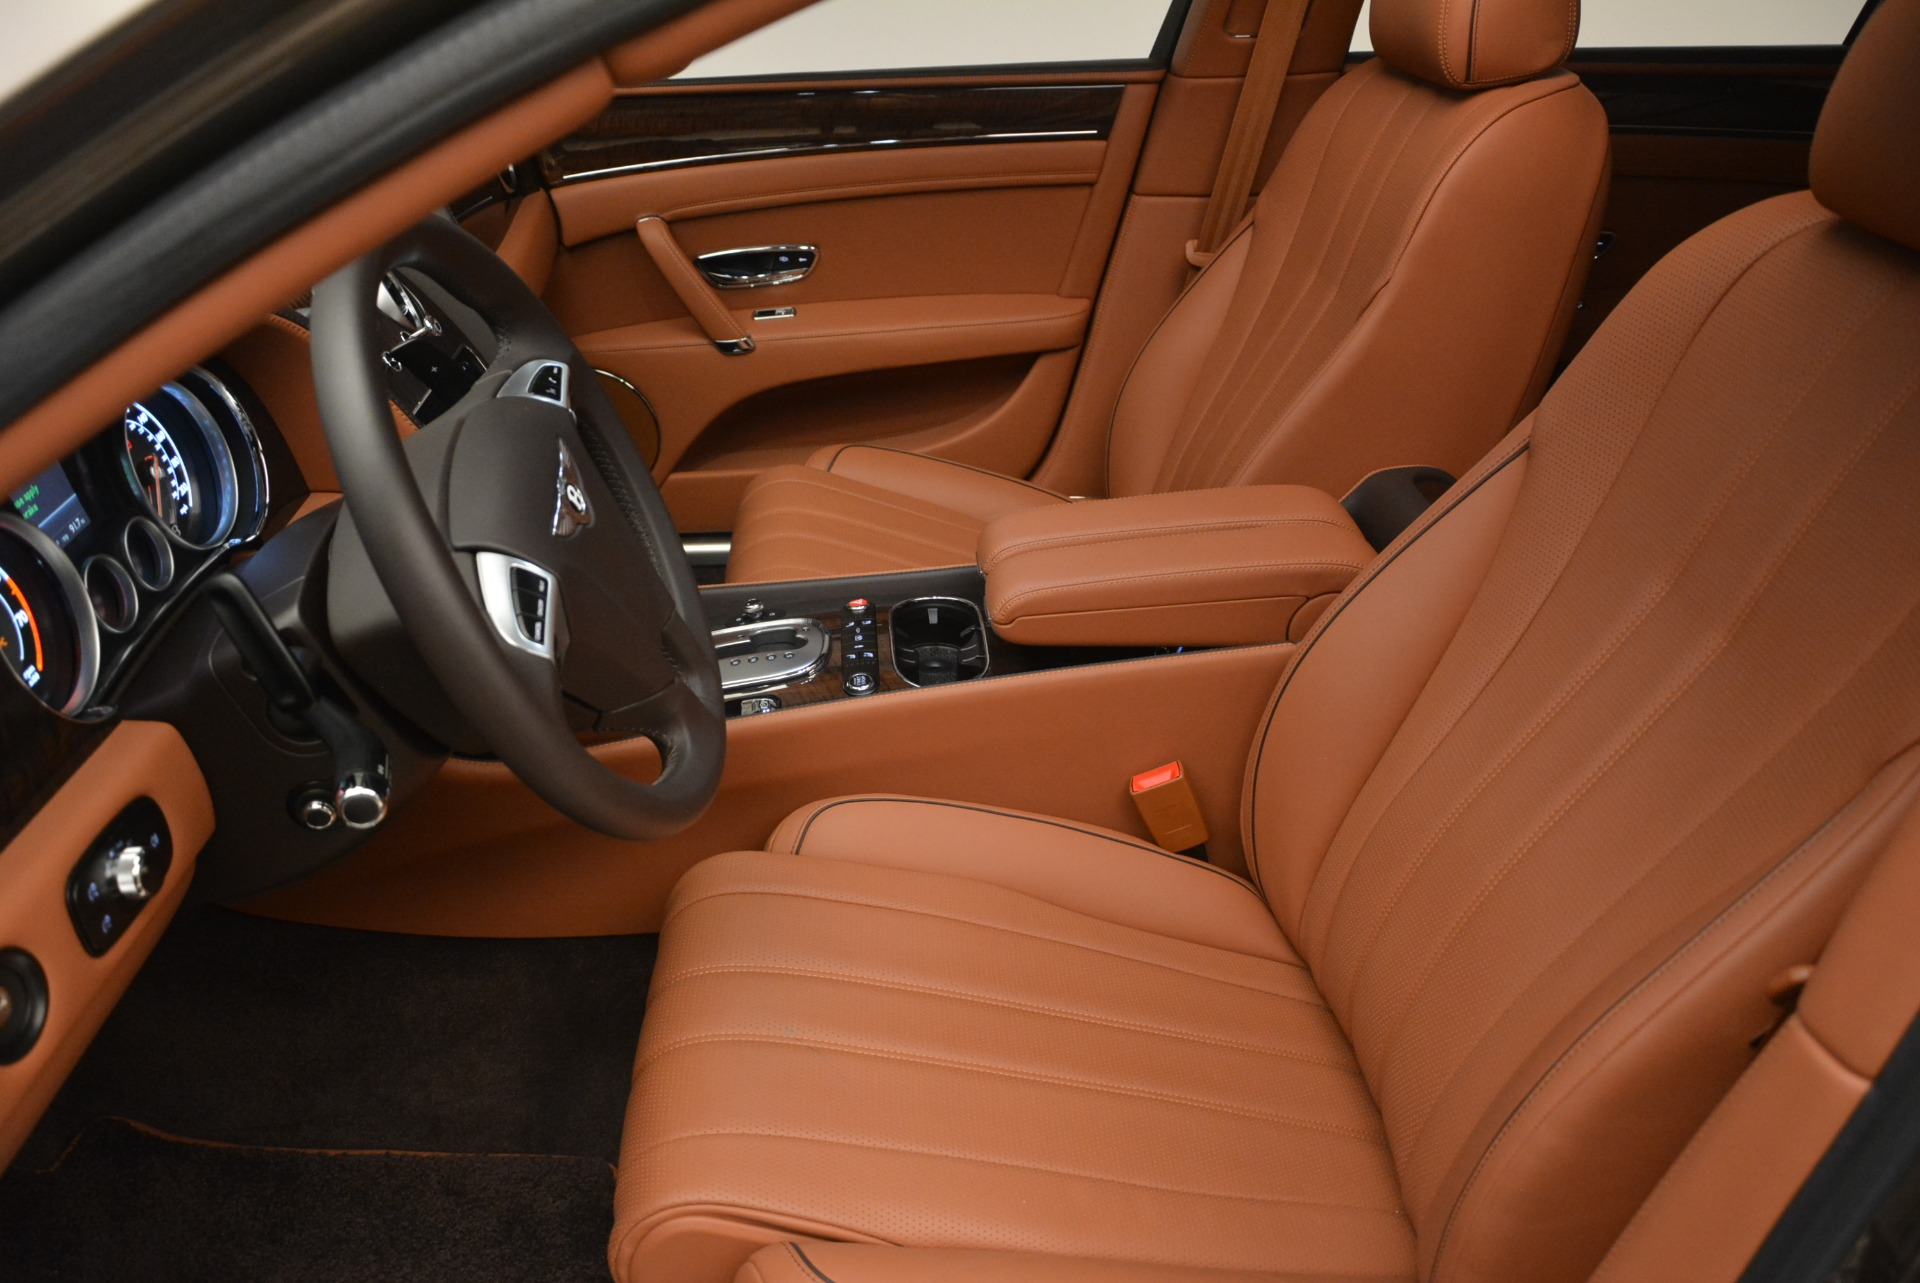 Used 2015 Bentley Flying Spur W12 For Sale In Westport, CT 2266_p18